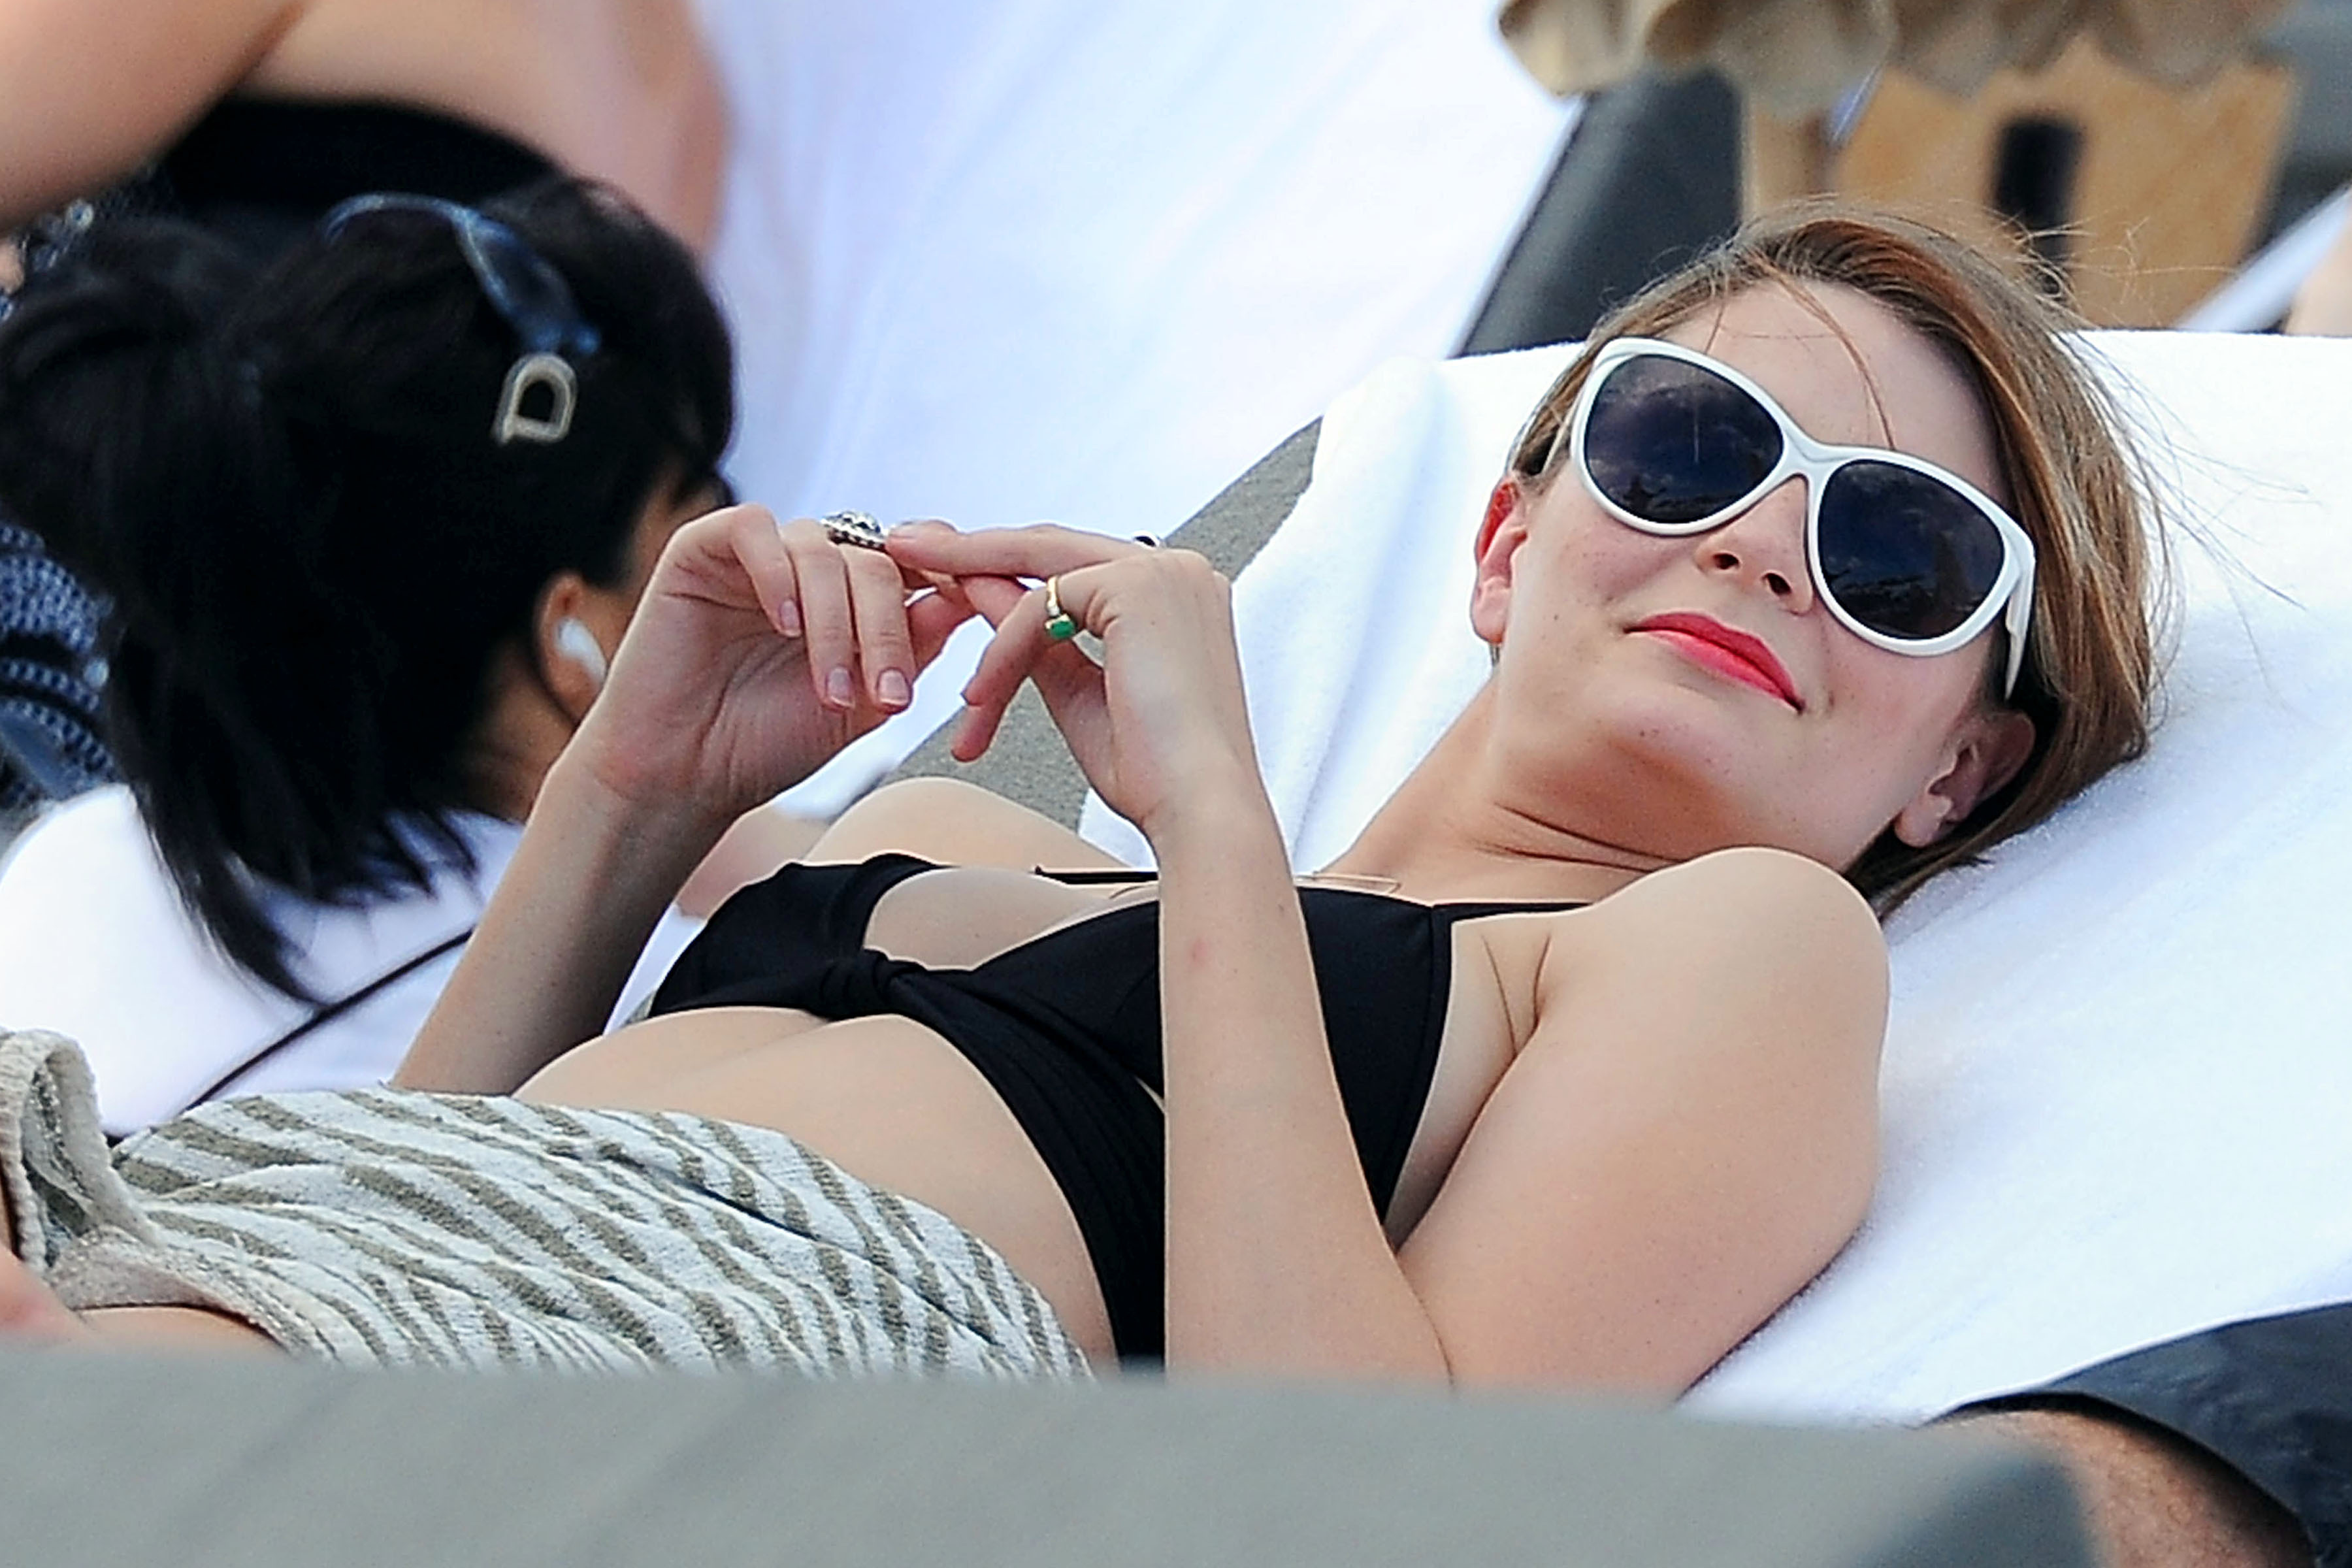 311872761_Mischa_Barton_Bikini_Candids_on_the_Beach_in_Miami_December_27_2011_124_122_70lo.jpg